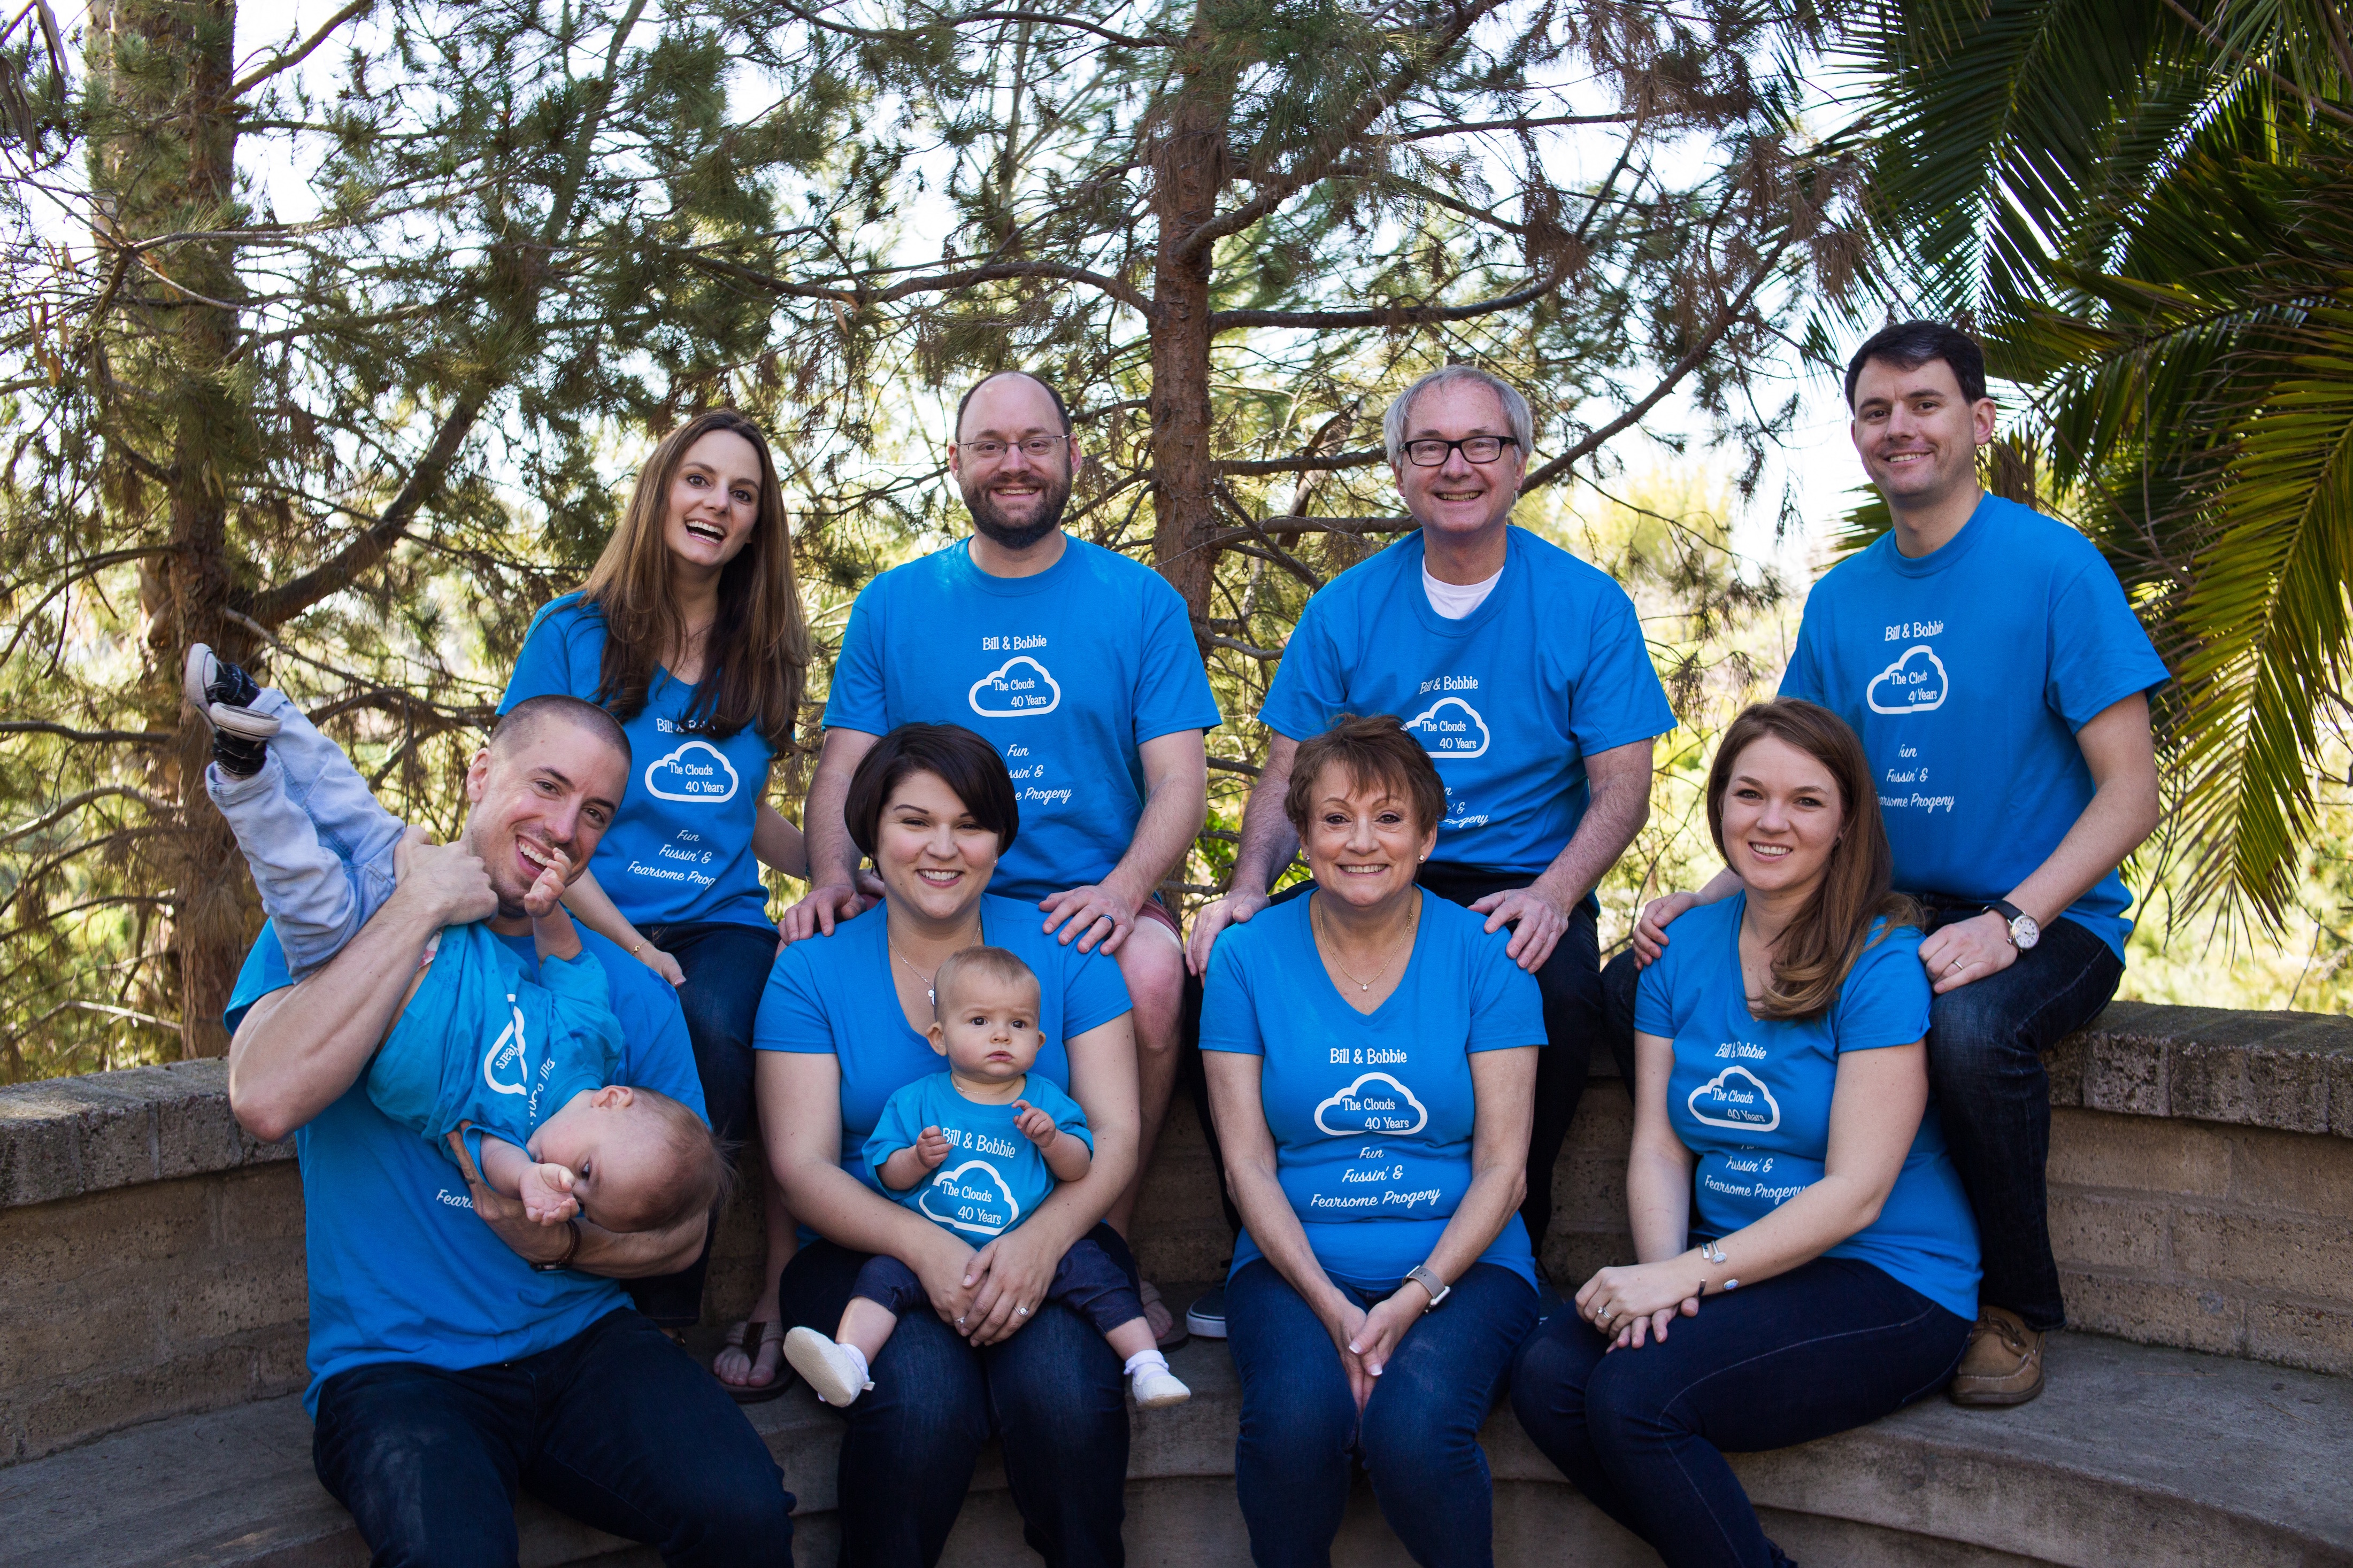 Shirt design san diego - San Diego Family Celebration T Shirt Photo